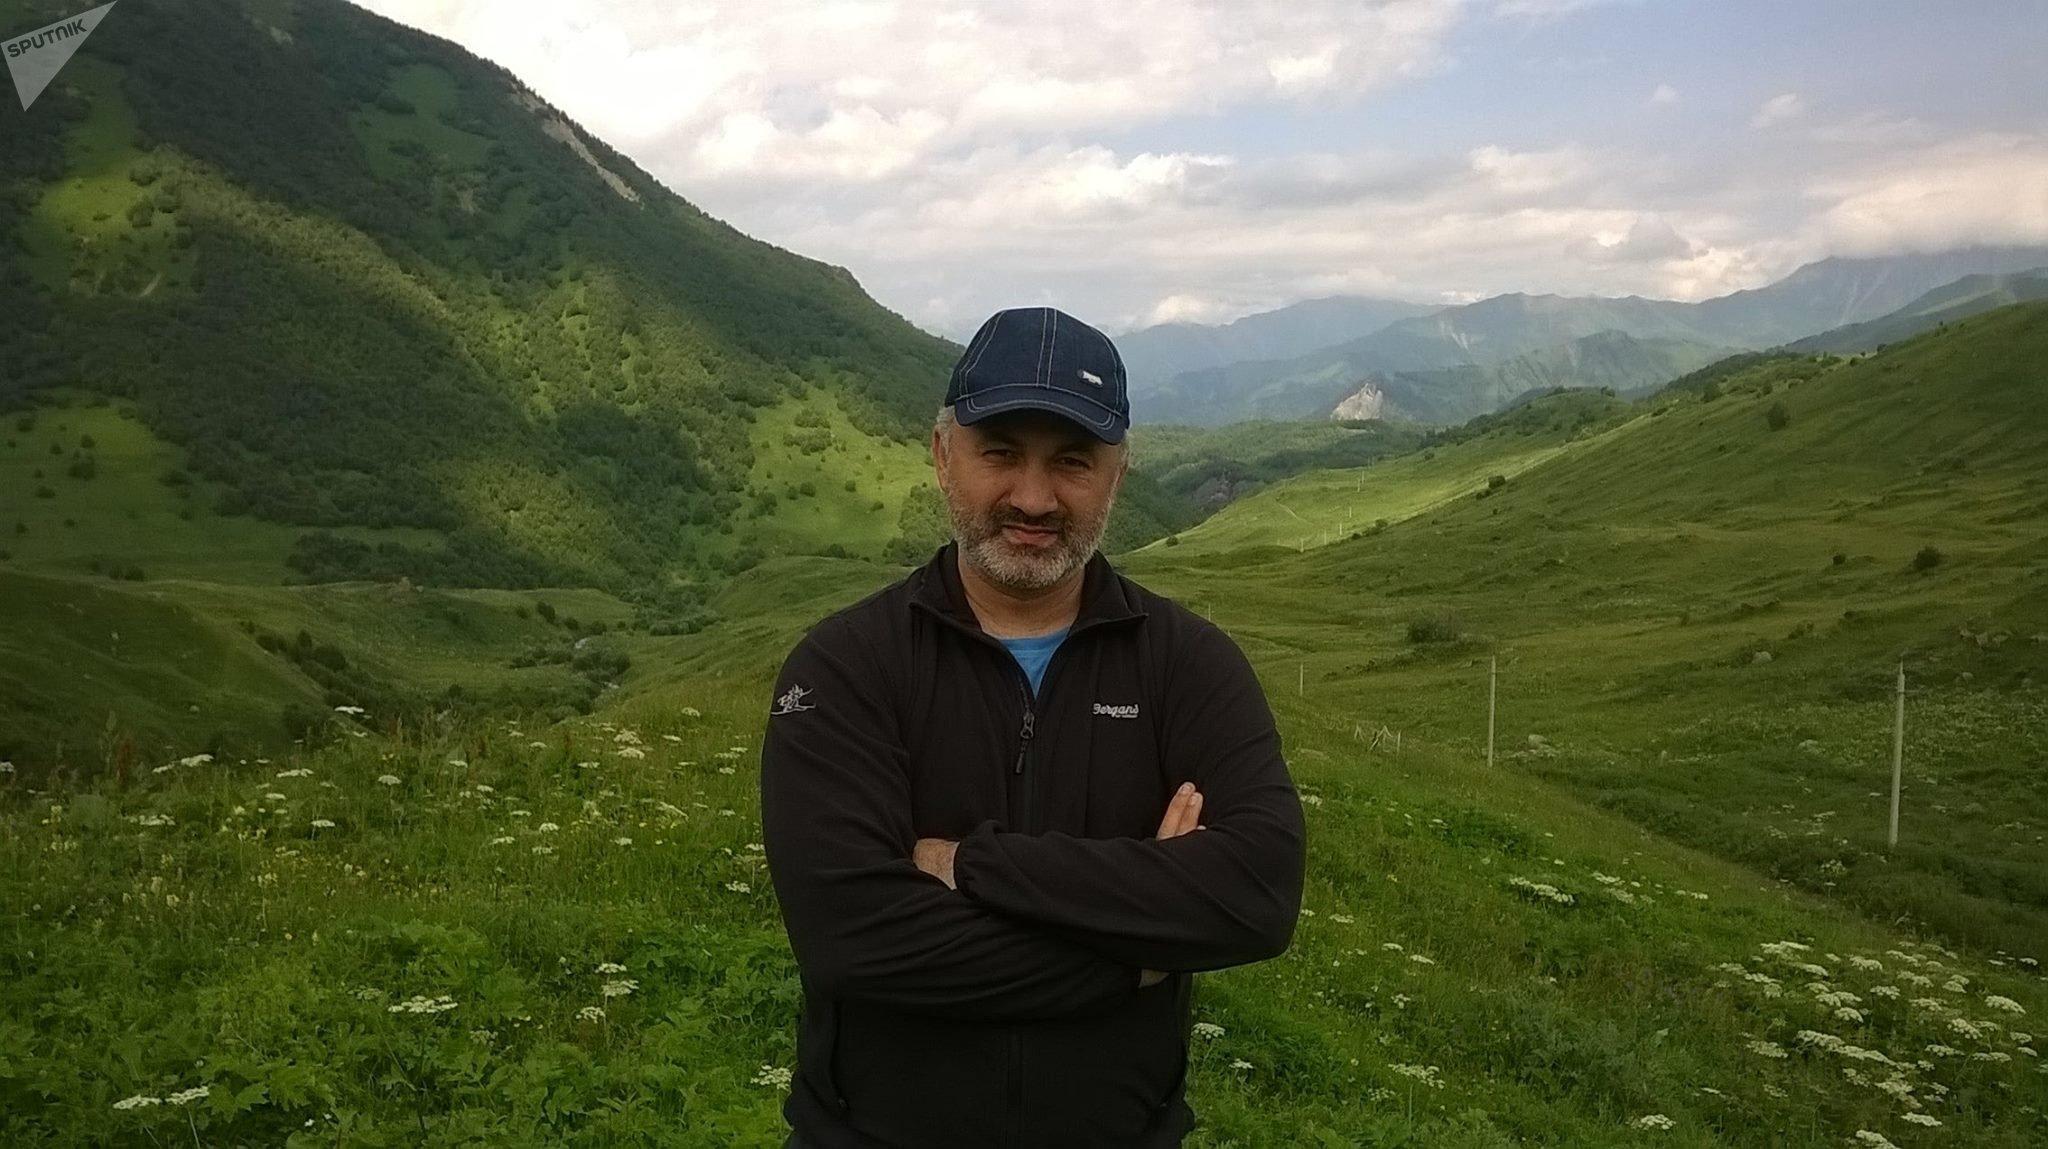 Роберт Цховребов